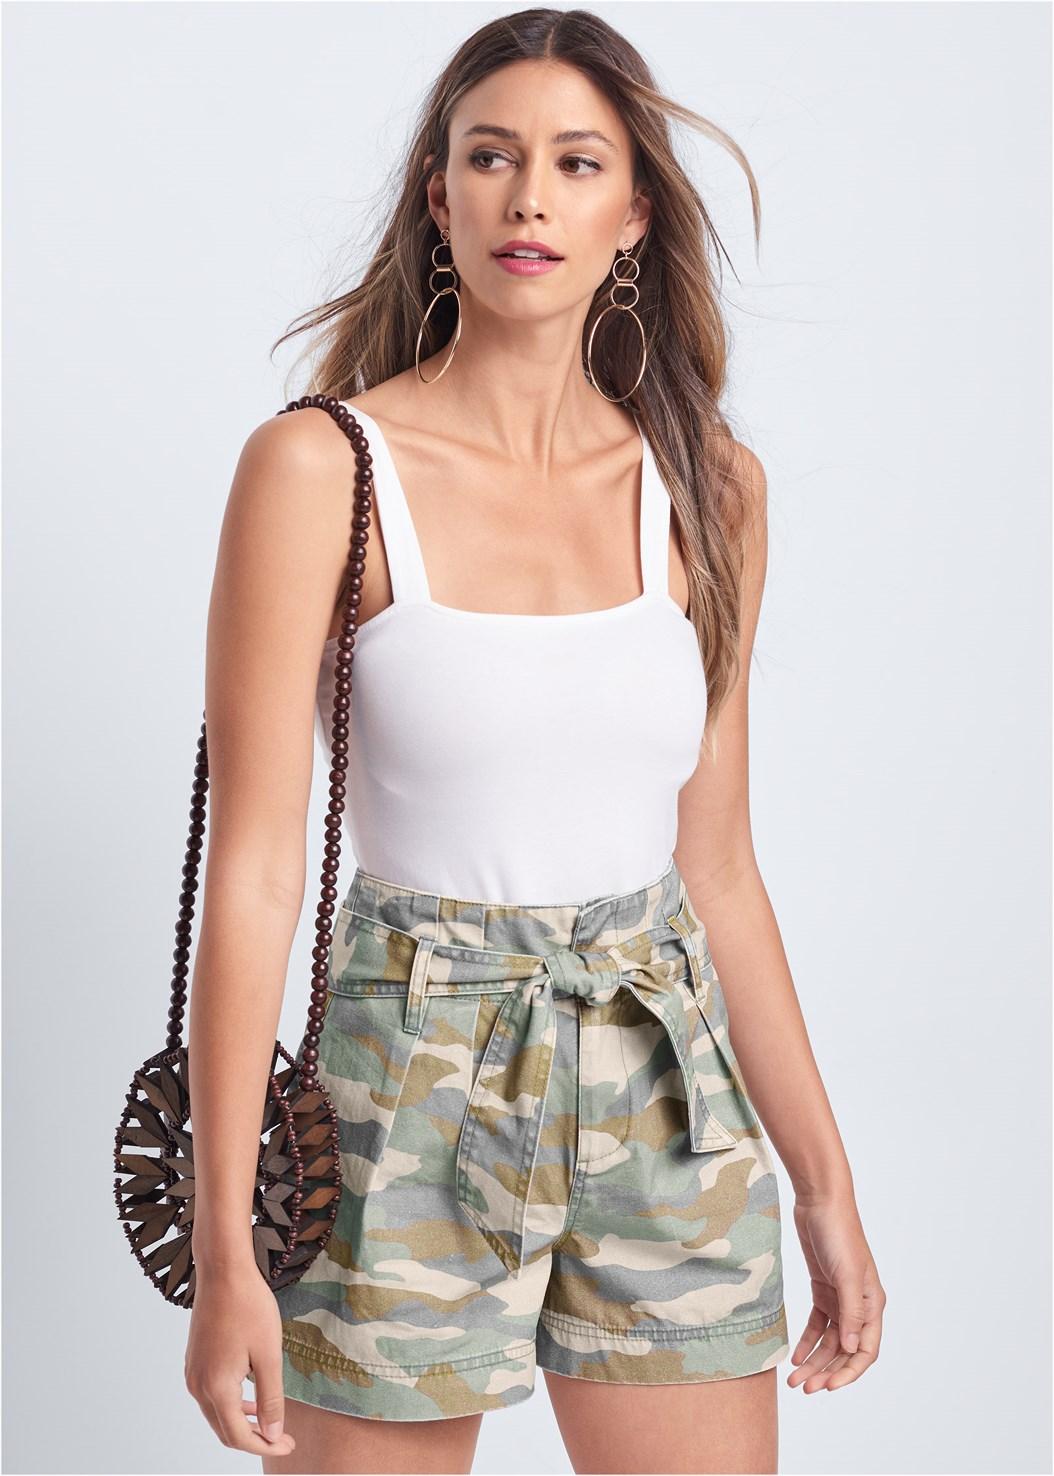 Belted Camo Shorts,Square Neck Bodysuit,Circle Basket Wooden Bag